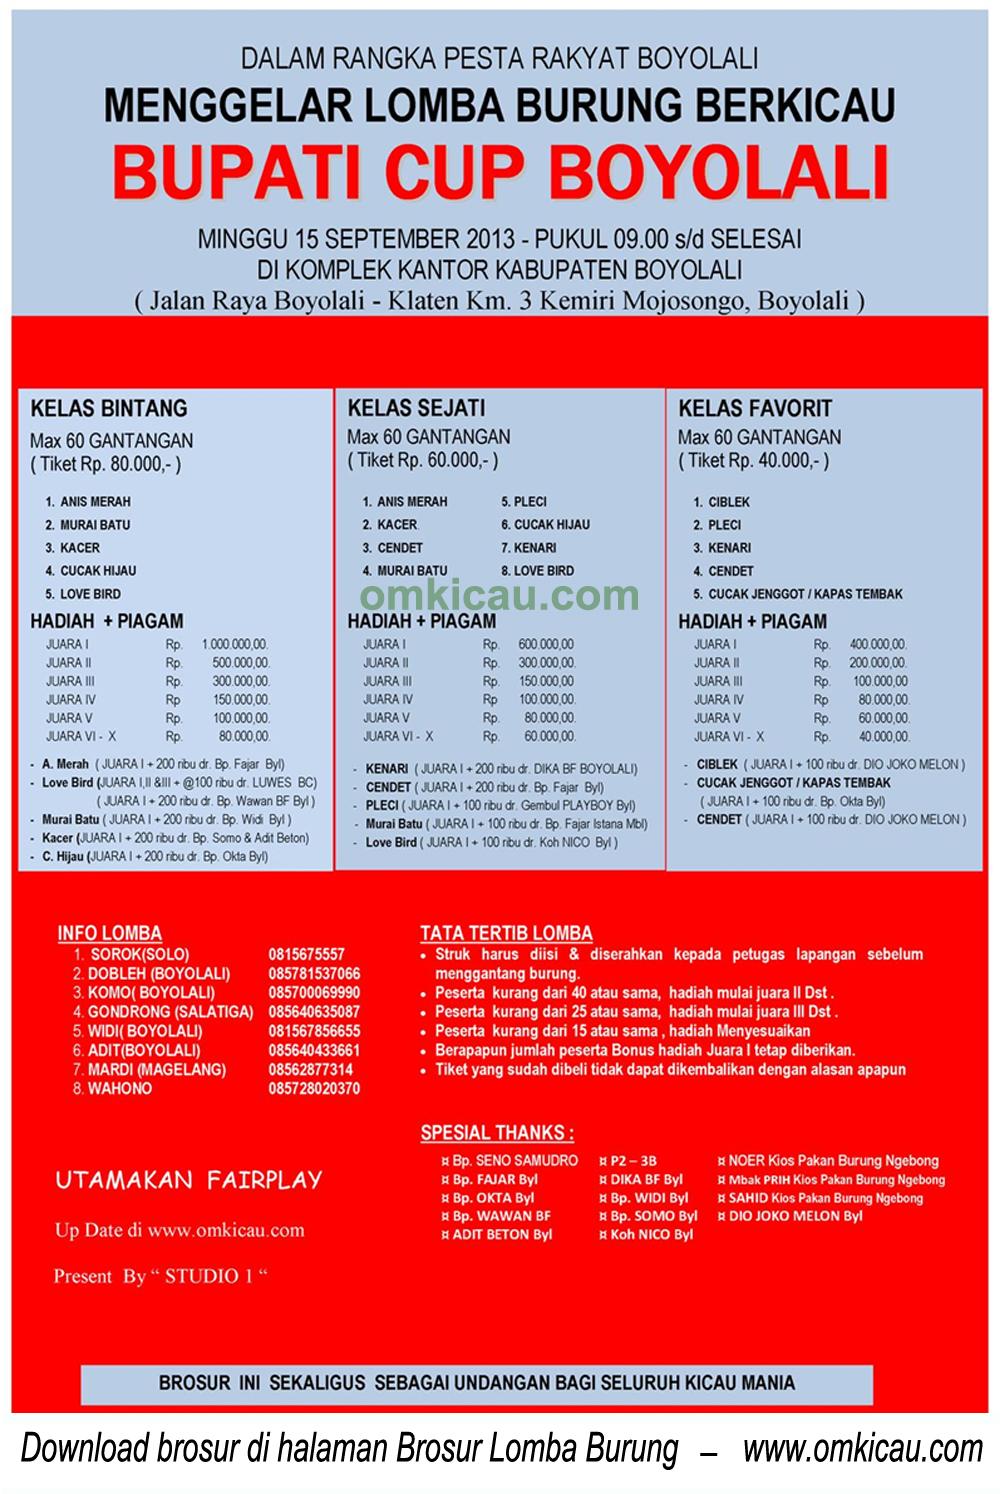 Brosur Lomba Burung Bupati Cup - Boyolali - 15 Sept 2013